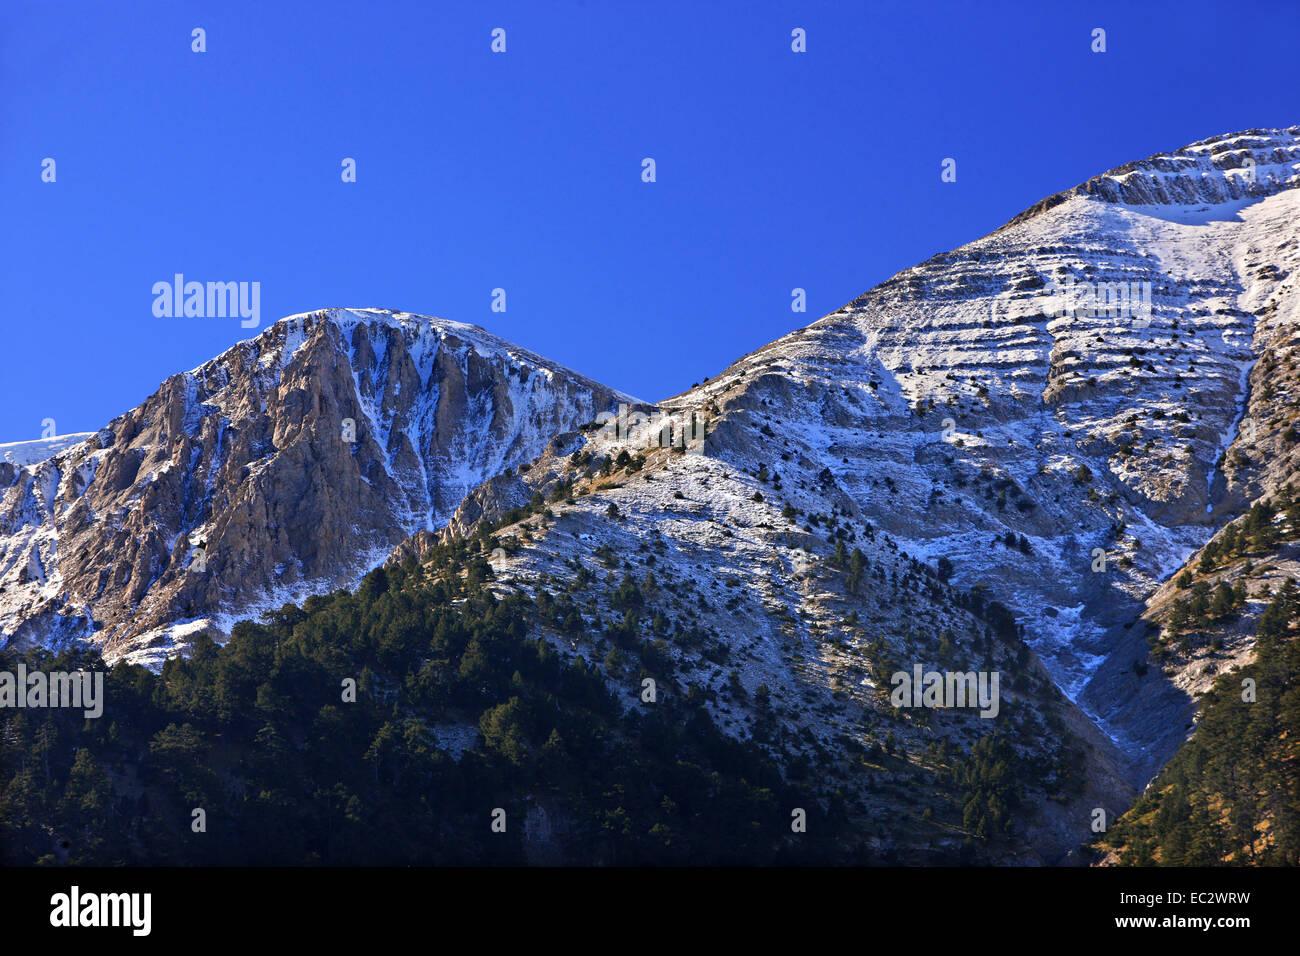 Mount Olympus, 'home of the gods', Pieria, Macedonia, Greece. - Stock Image